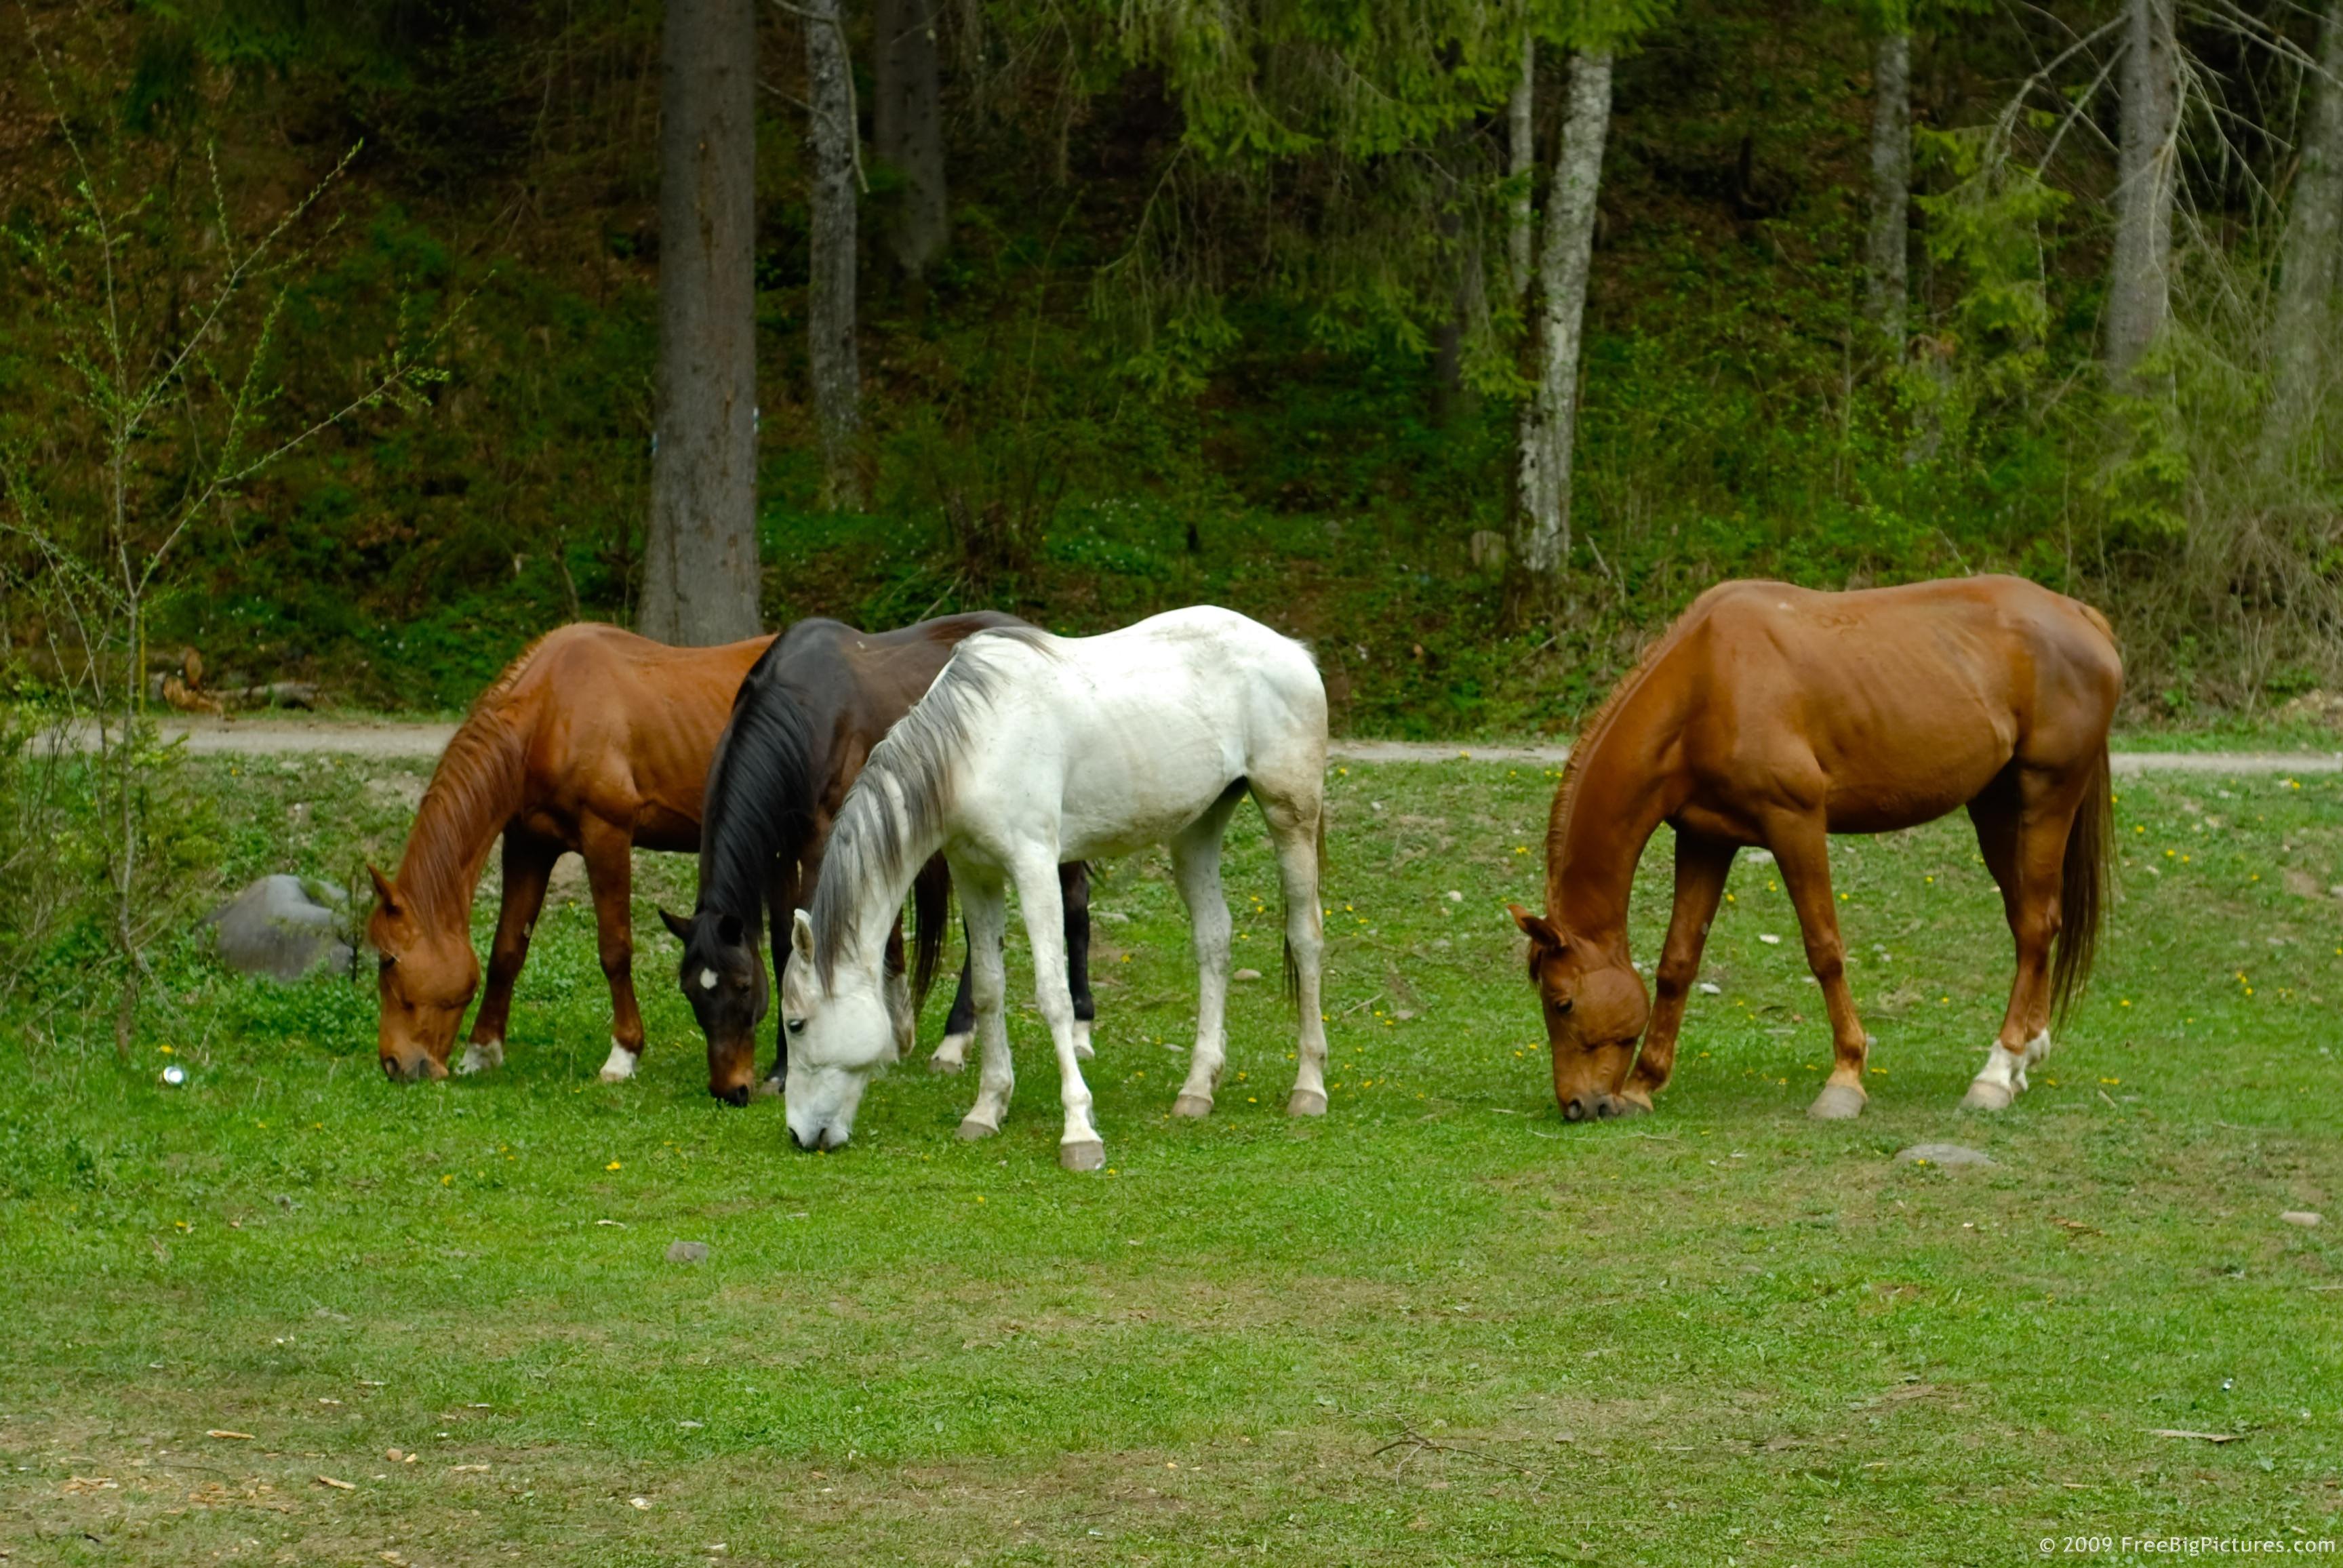 http://freebigpictures.com/wp-content/uploads/2009/09/horses-pasture.jpg